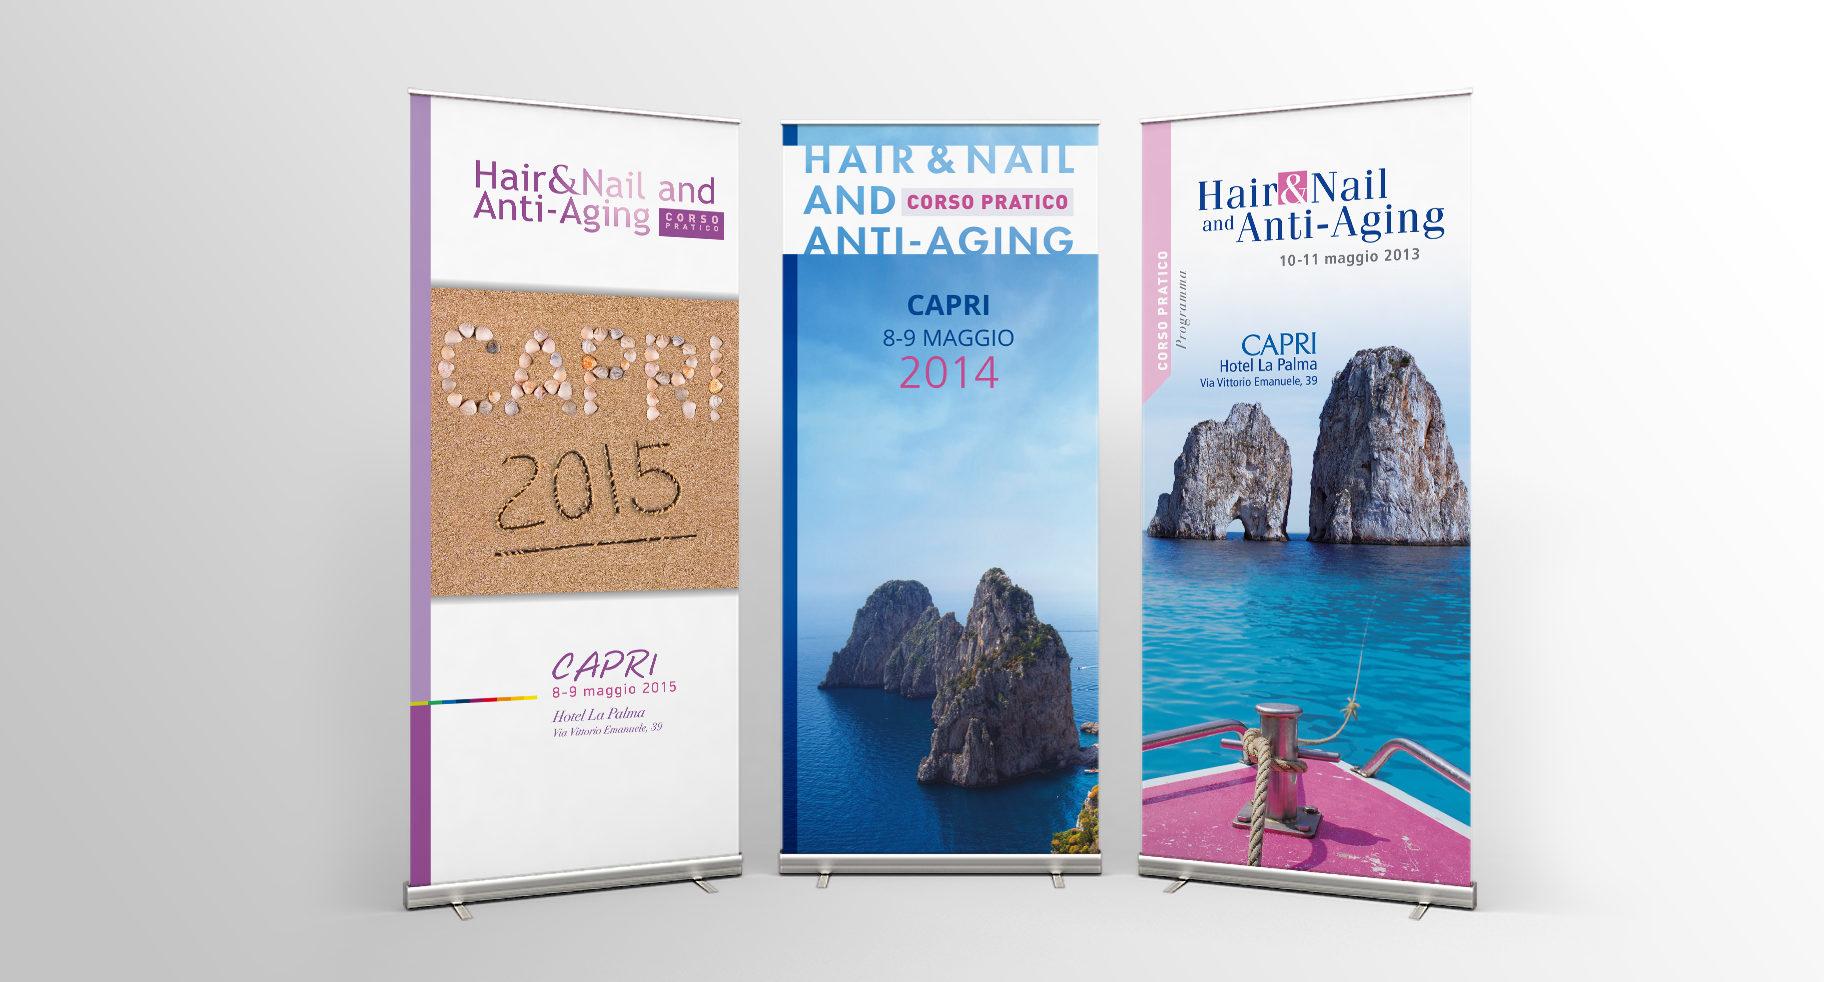 Hair&Nail and Anti-Aging-Capri-Roll-up